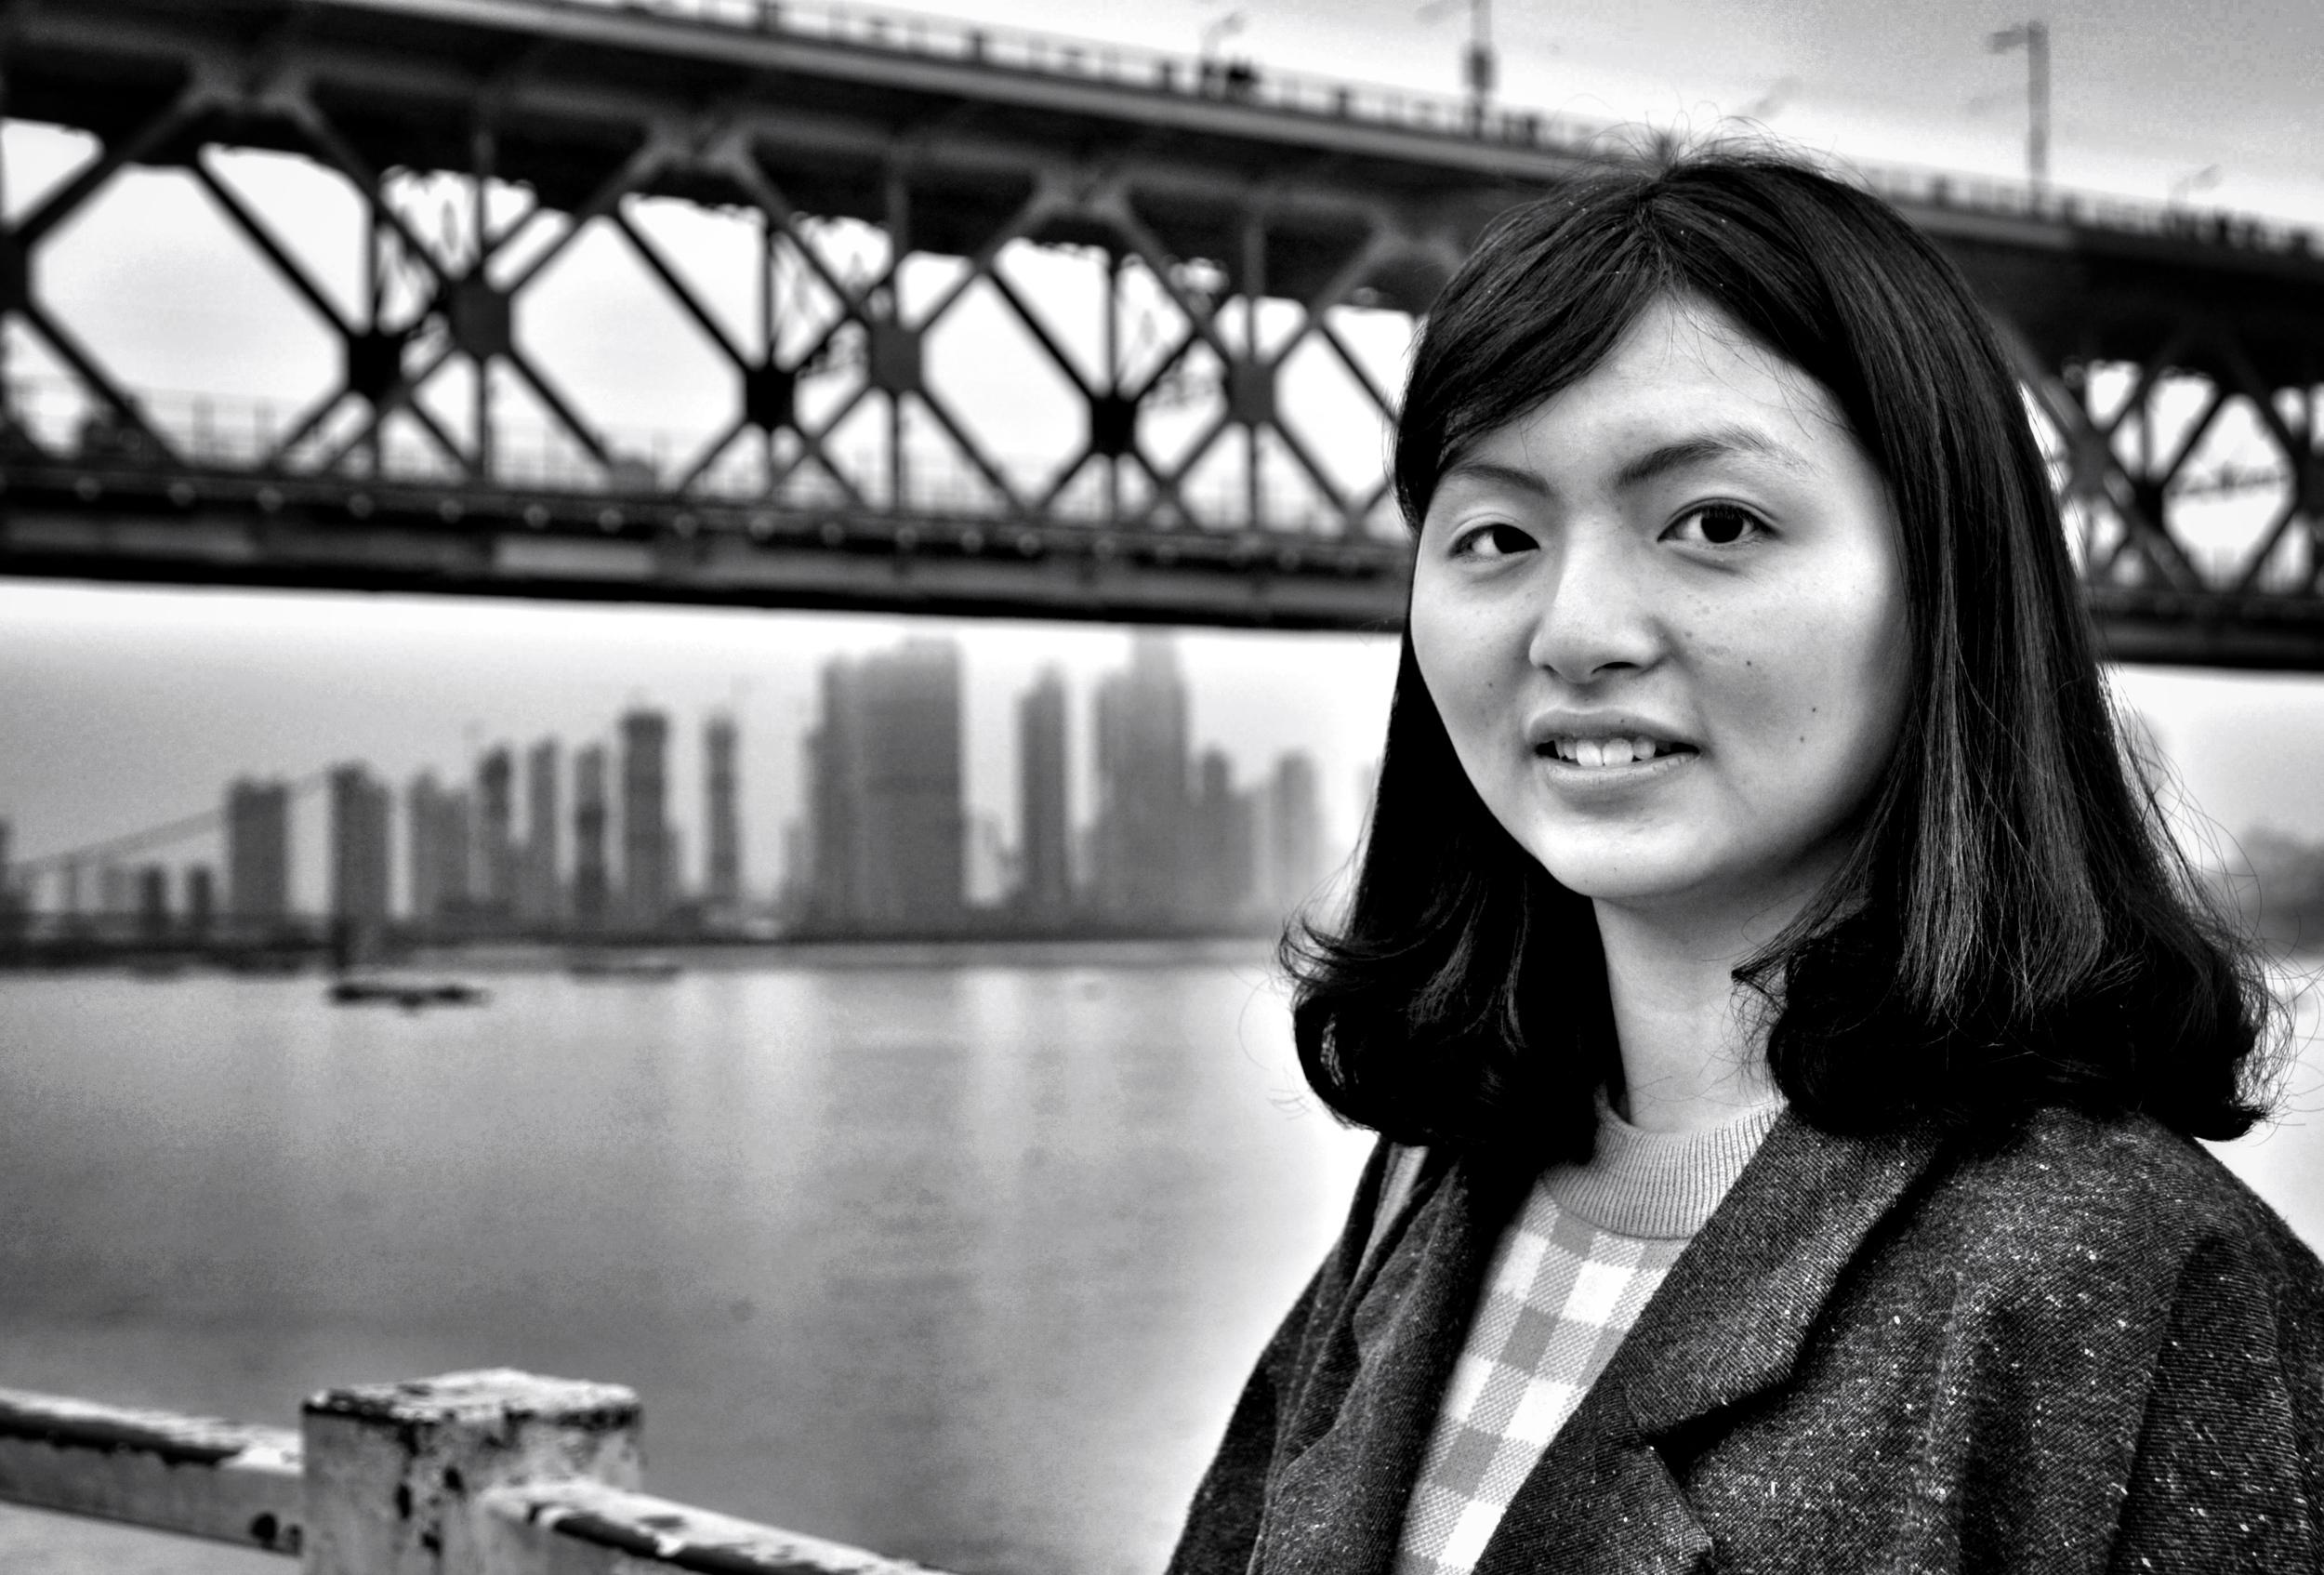 University student at Wuhan Yangtze River Bridge